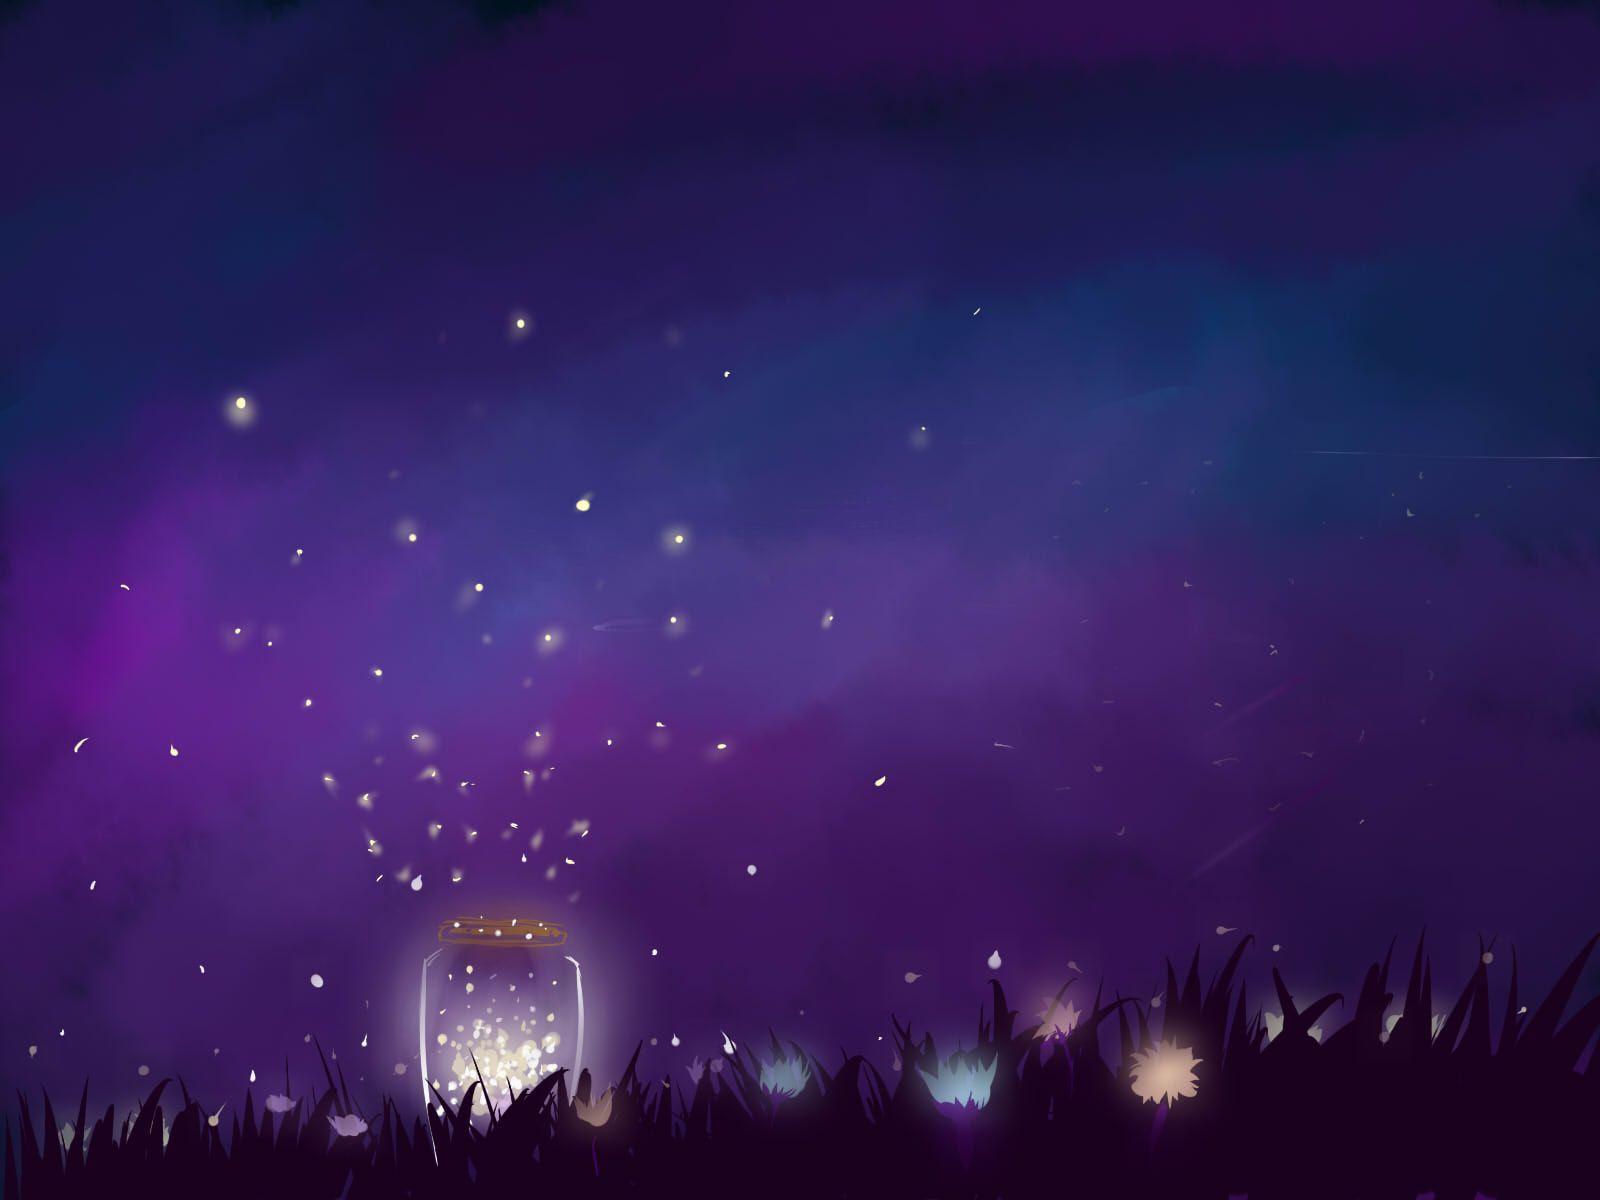 Image For Fireflies In A Jar Wallpaper